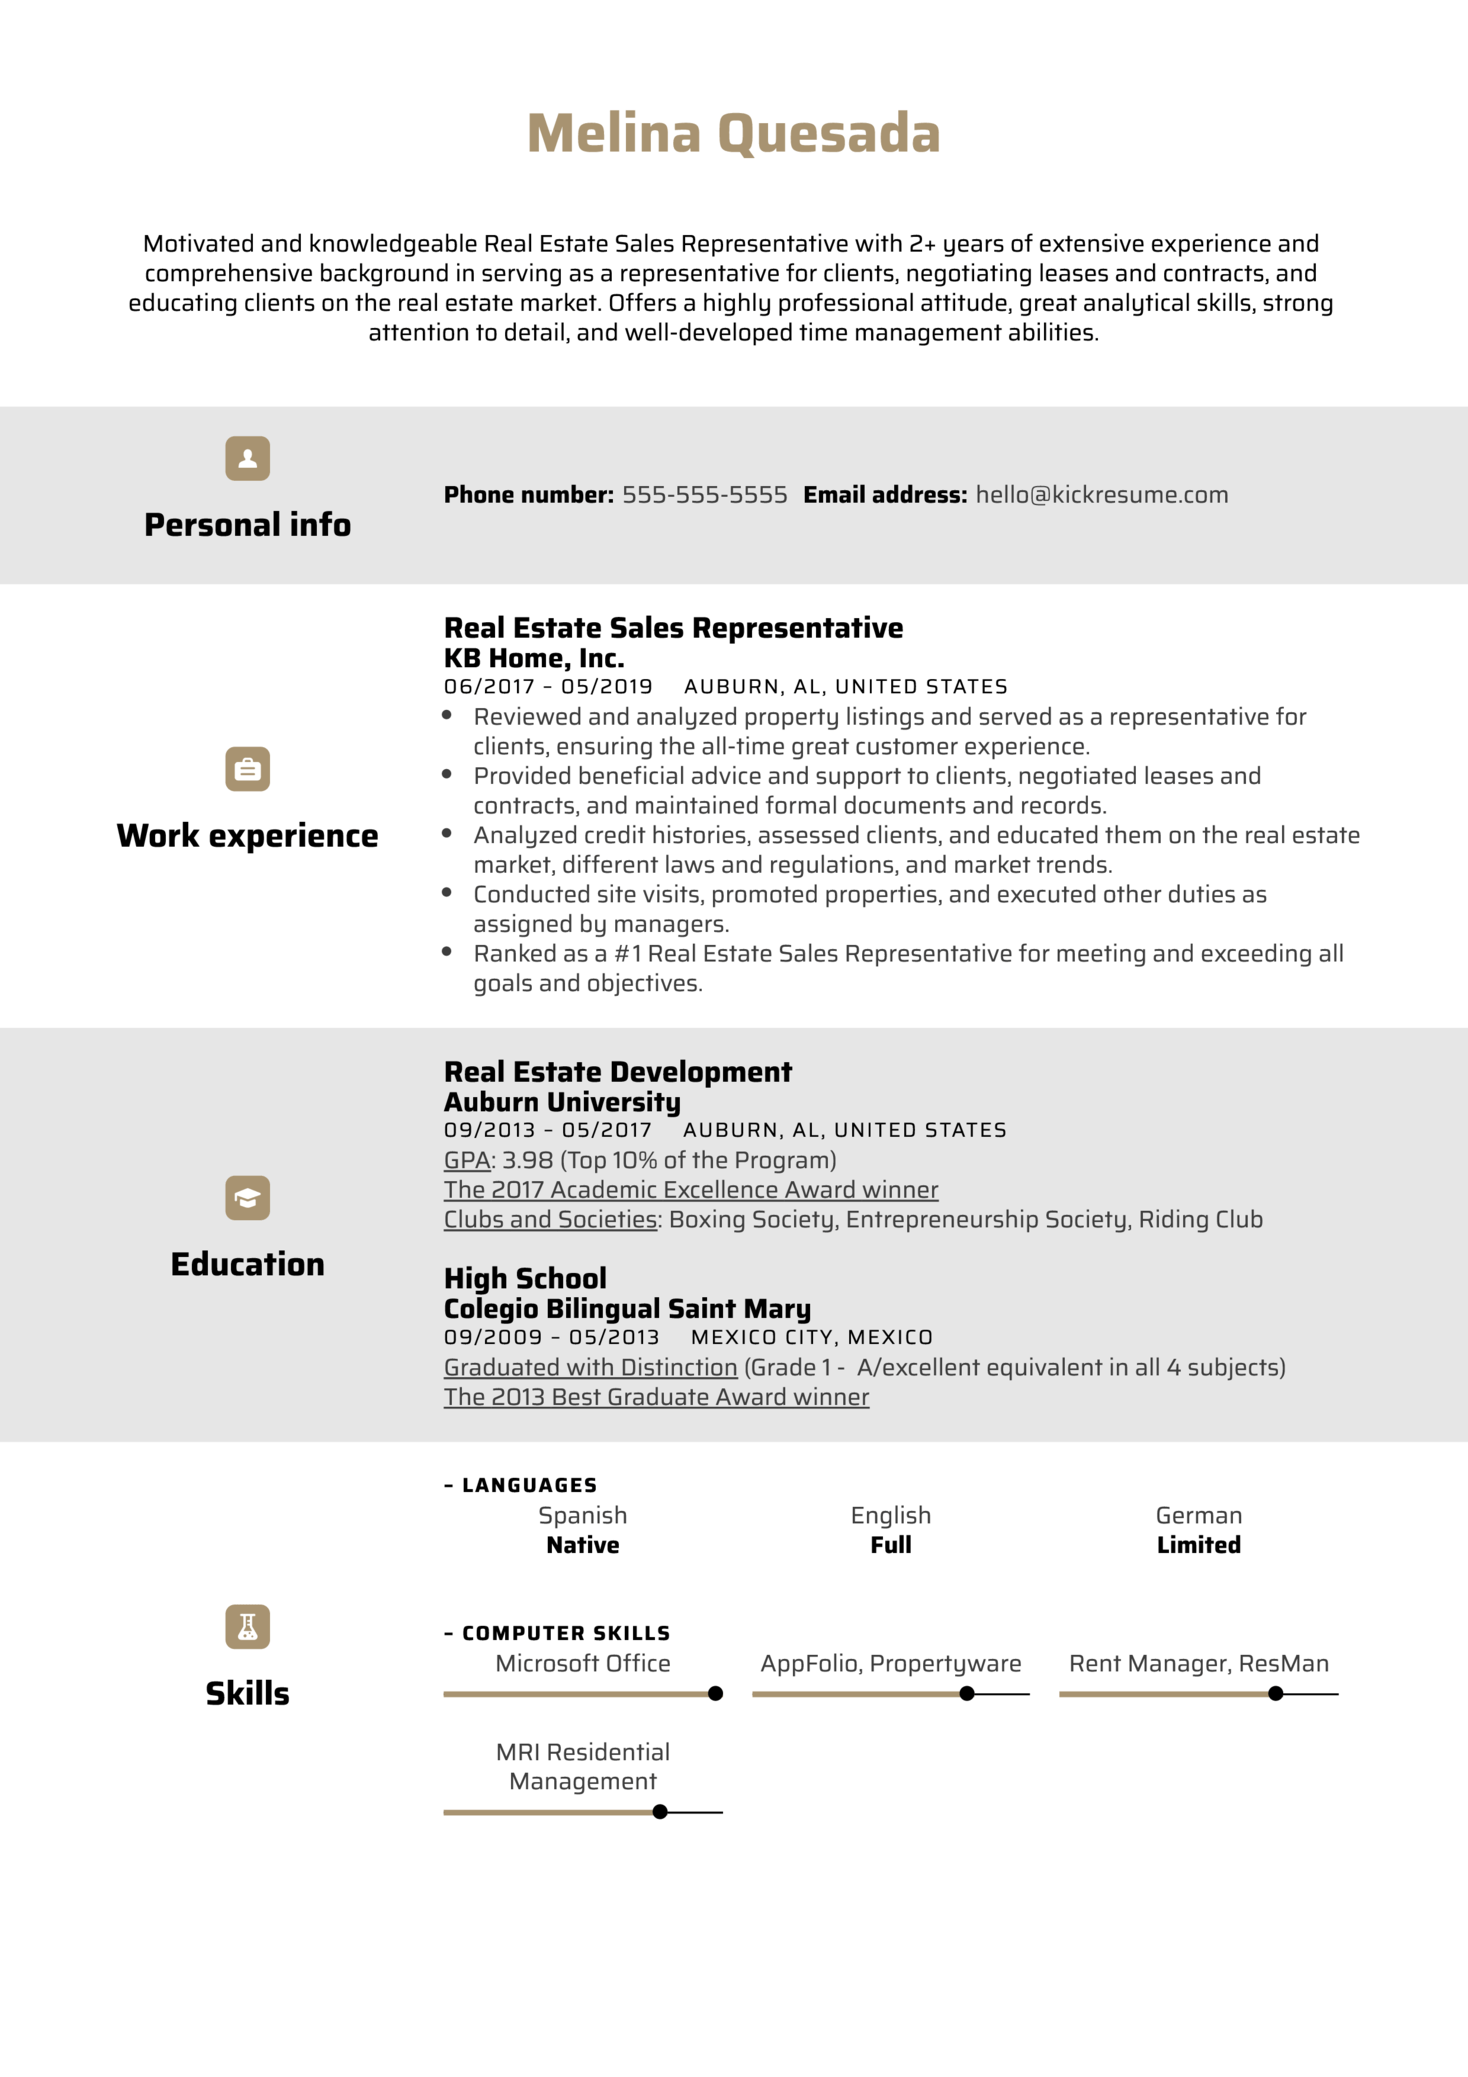 Real Estate Sales Representative Resume Example (časť 1)